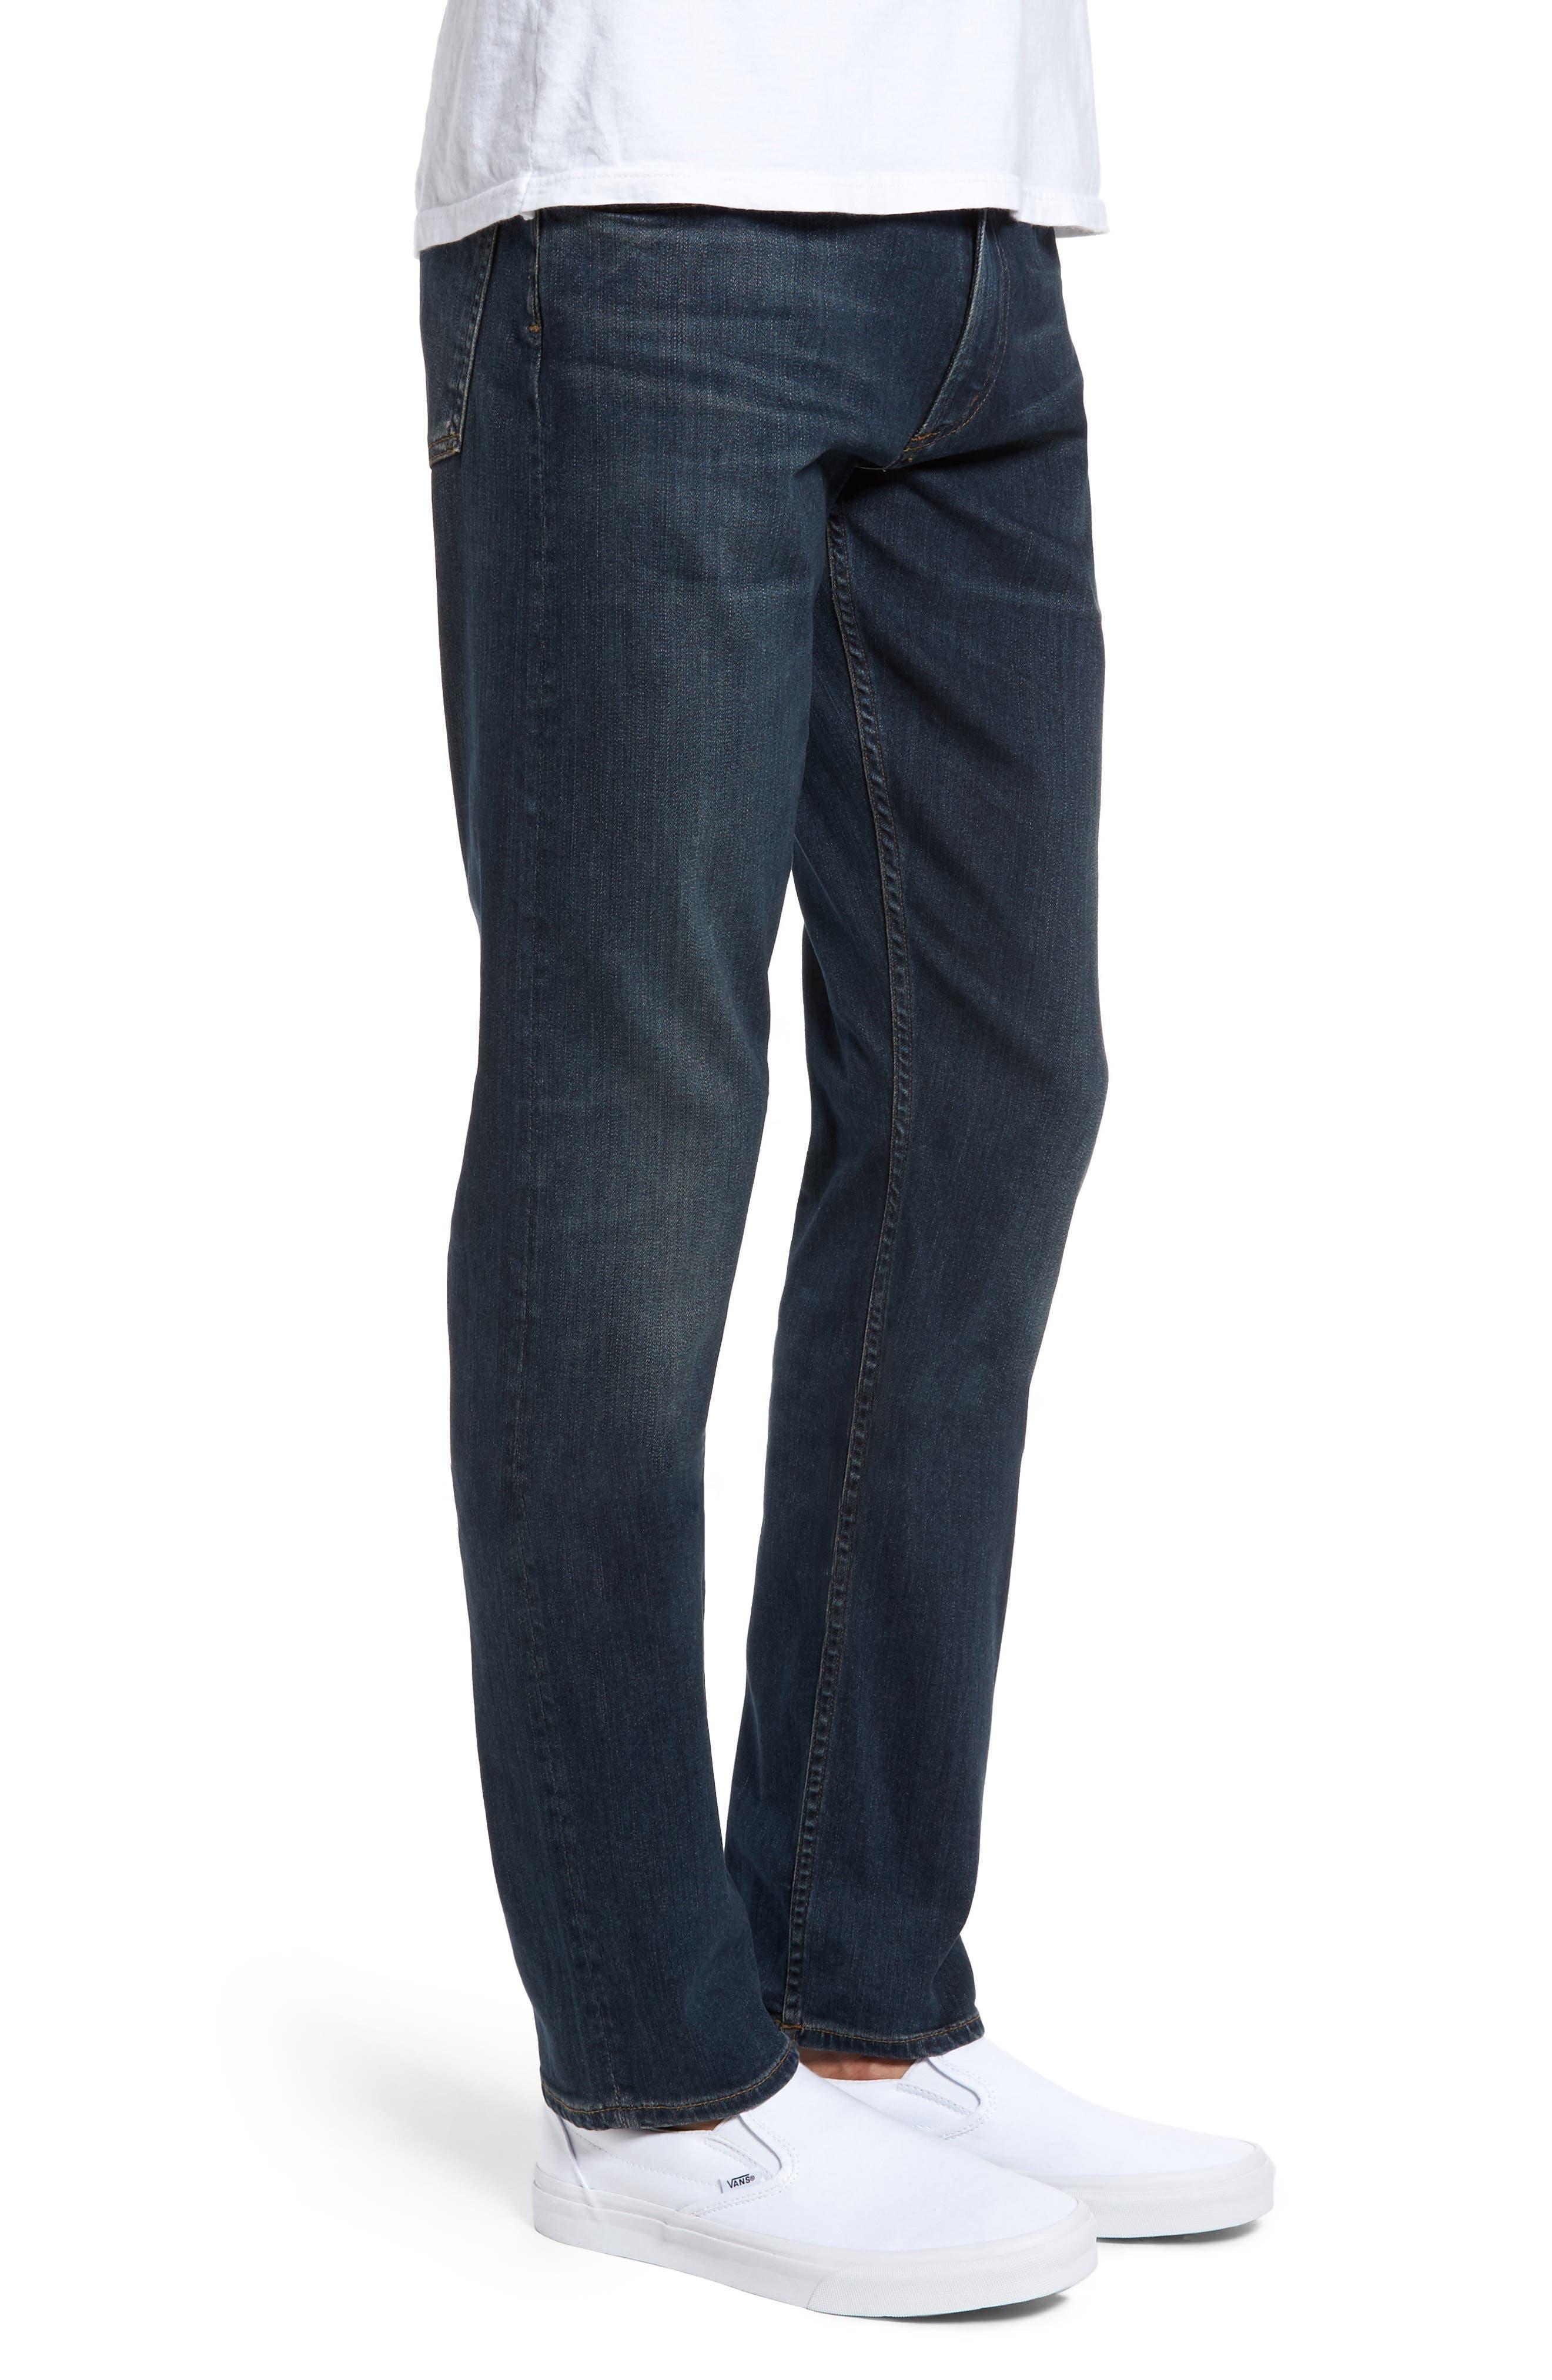 PERFORM - Bowery Slim Fit Jeans,                             Alternate thumbnail 3, color,                             Kingman